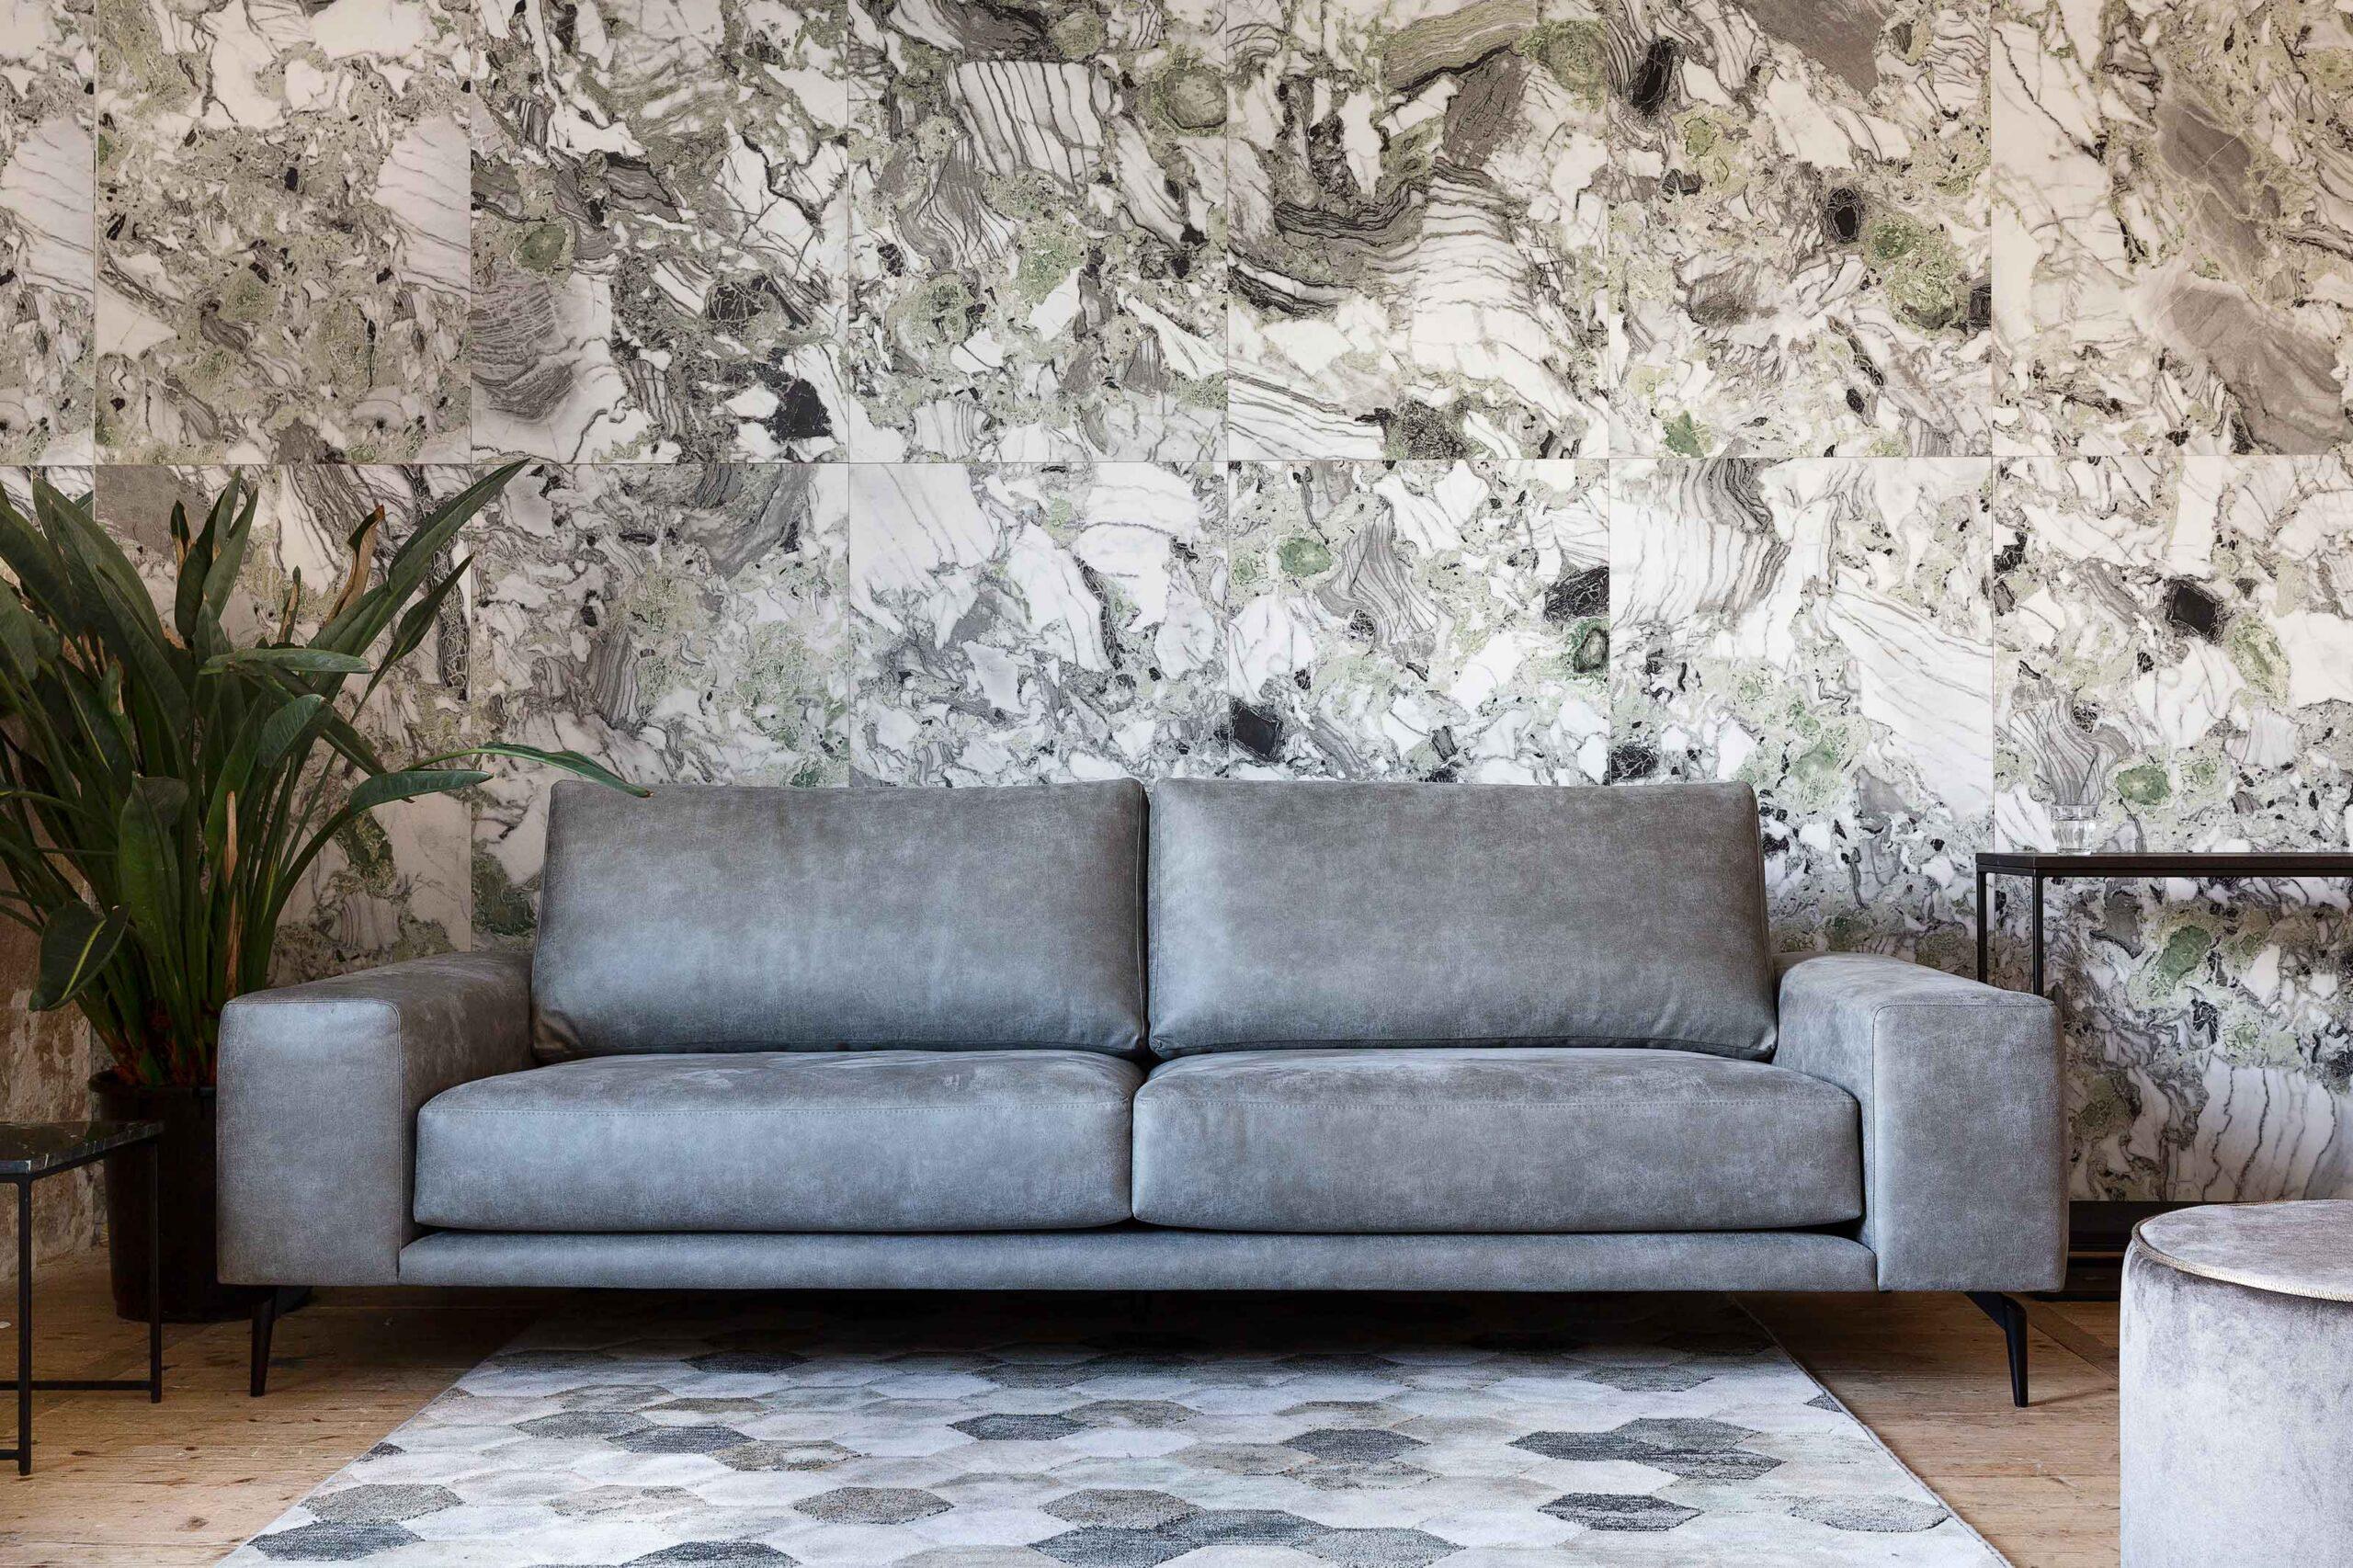 bella-milano-zitbank-bull-leer-soofs-interieur